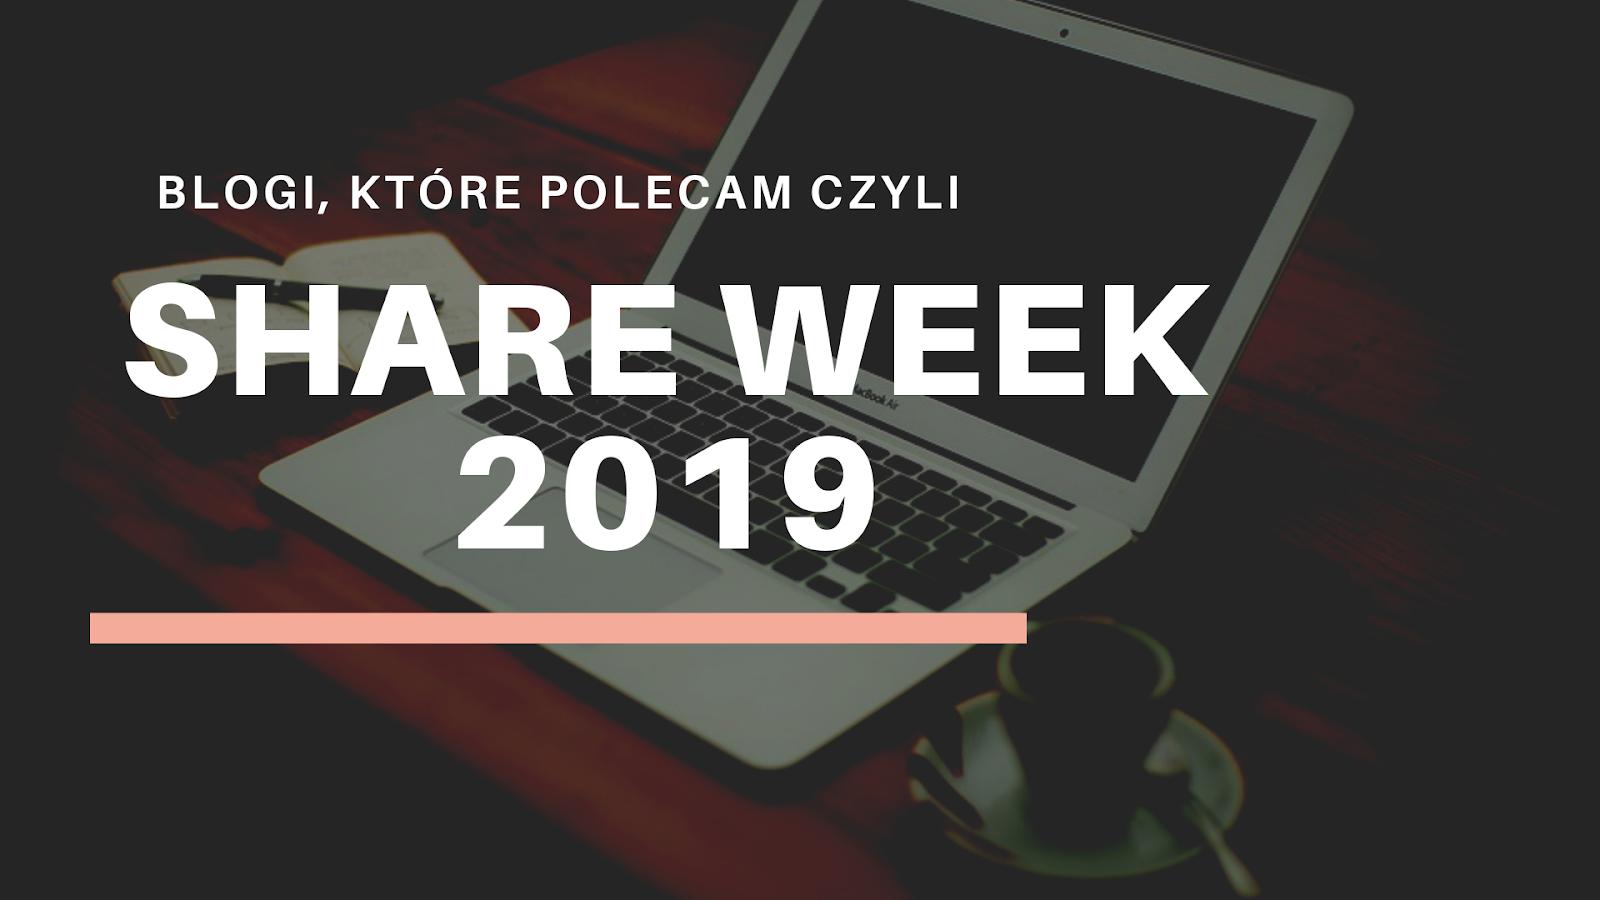 Blogi, które polecam - Share Week 2019